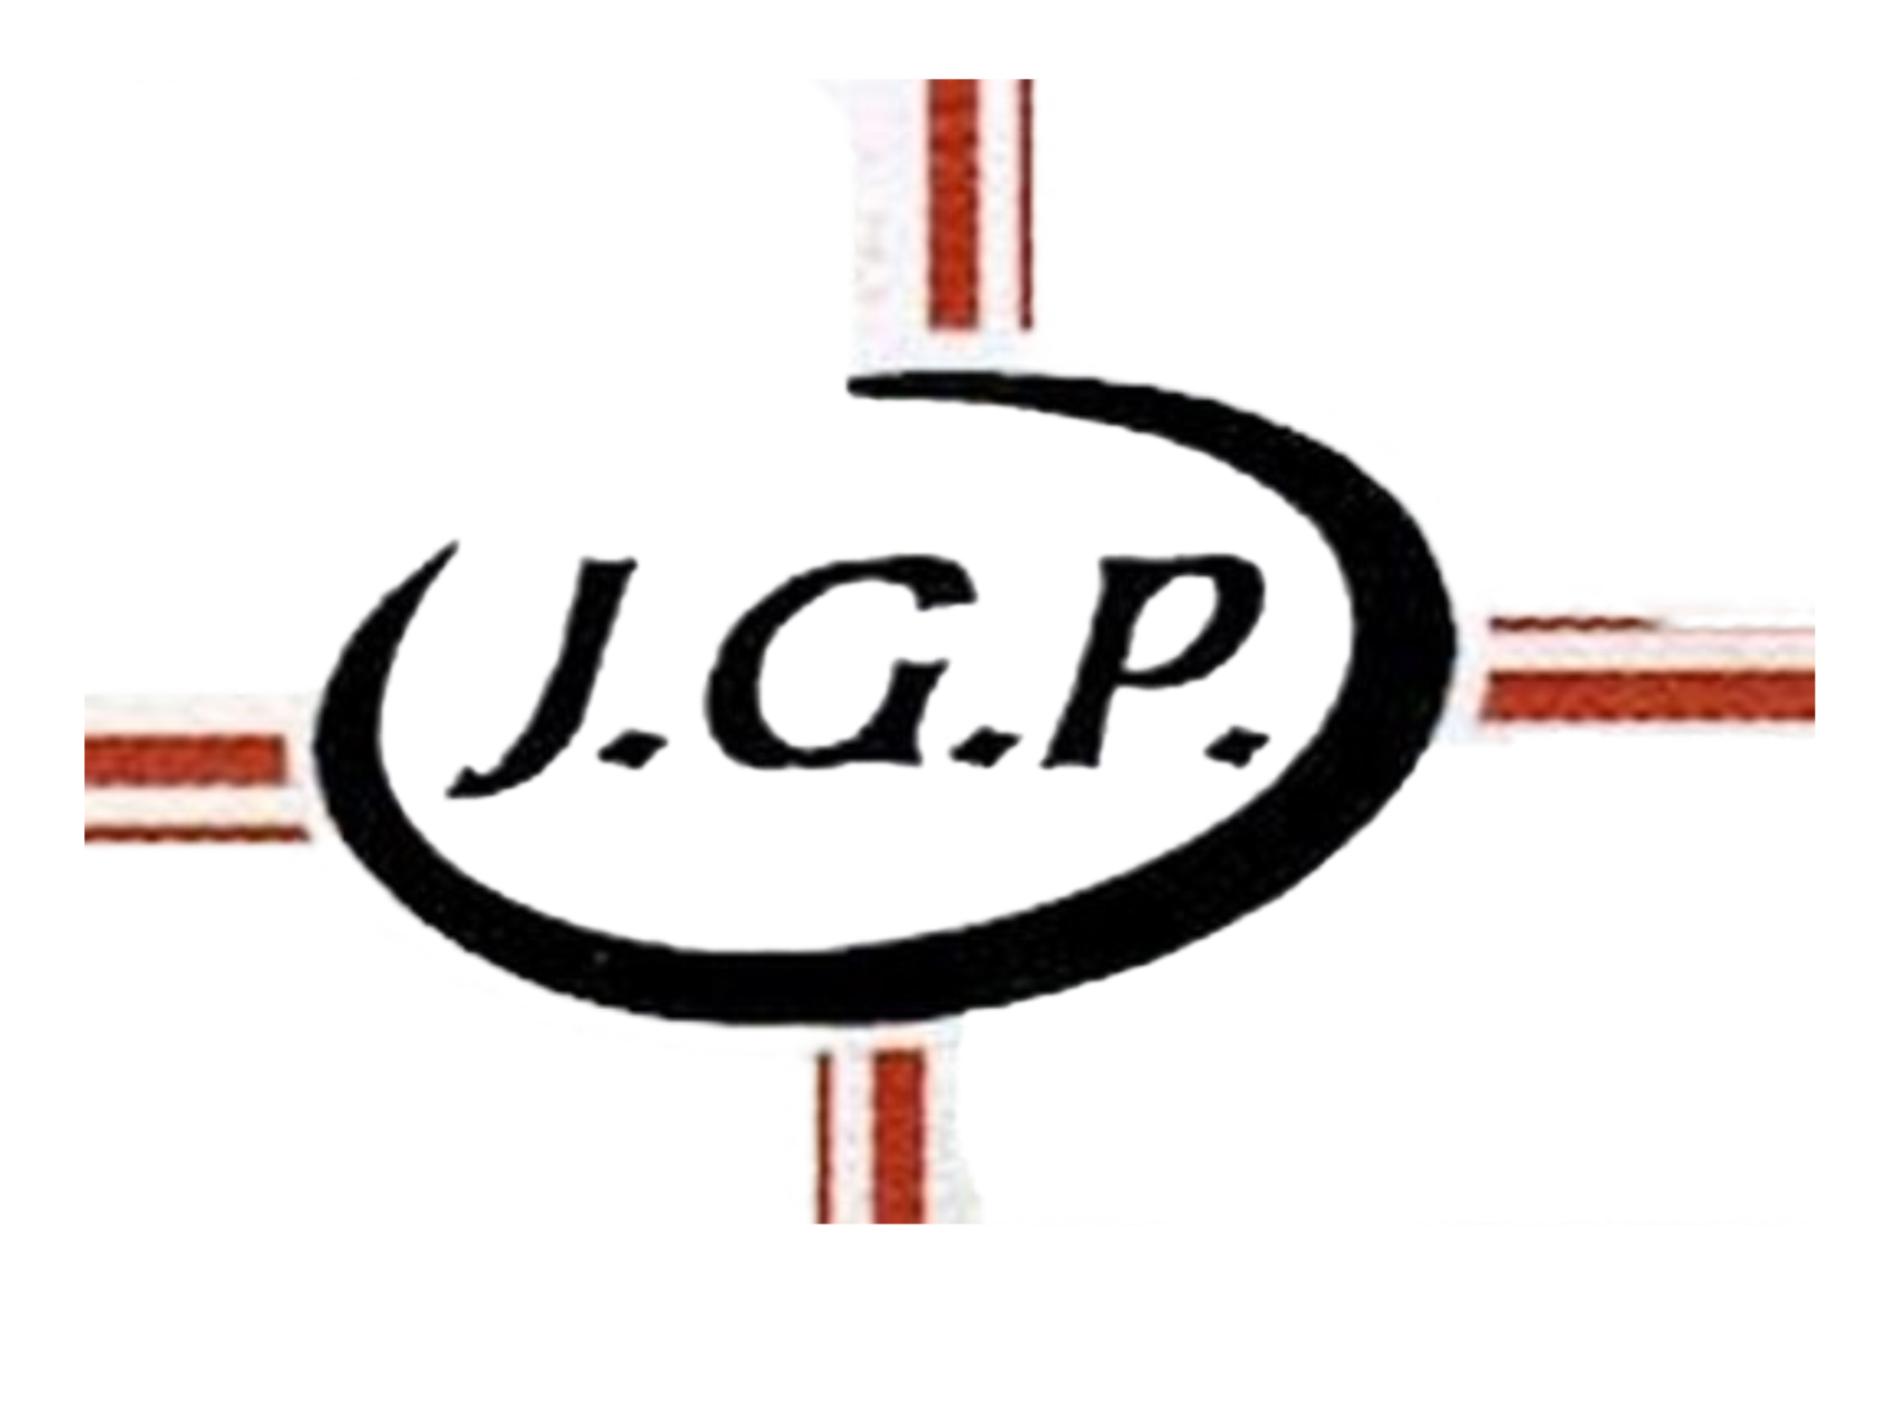 BIJOUX  -  J.G.P